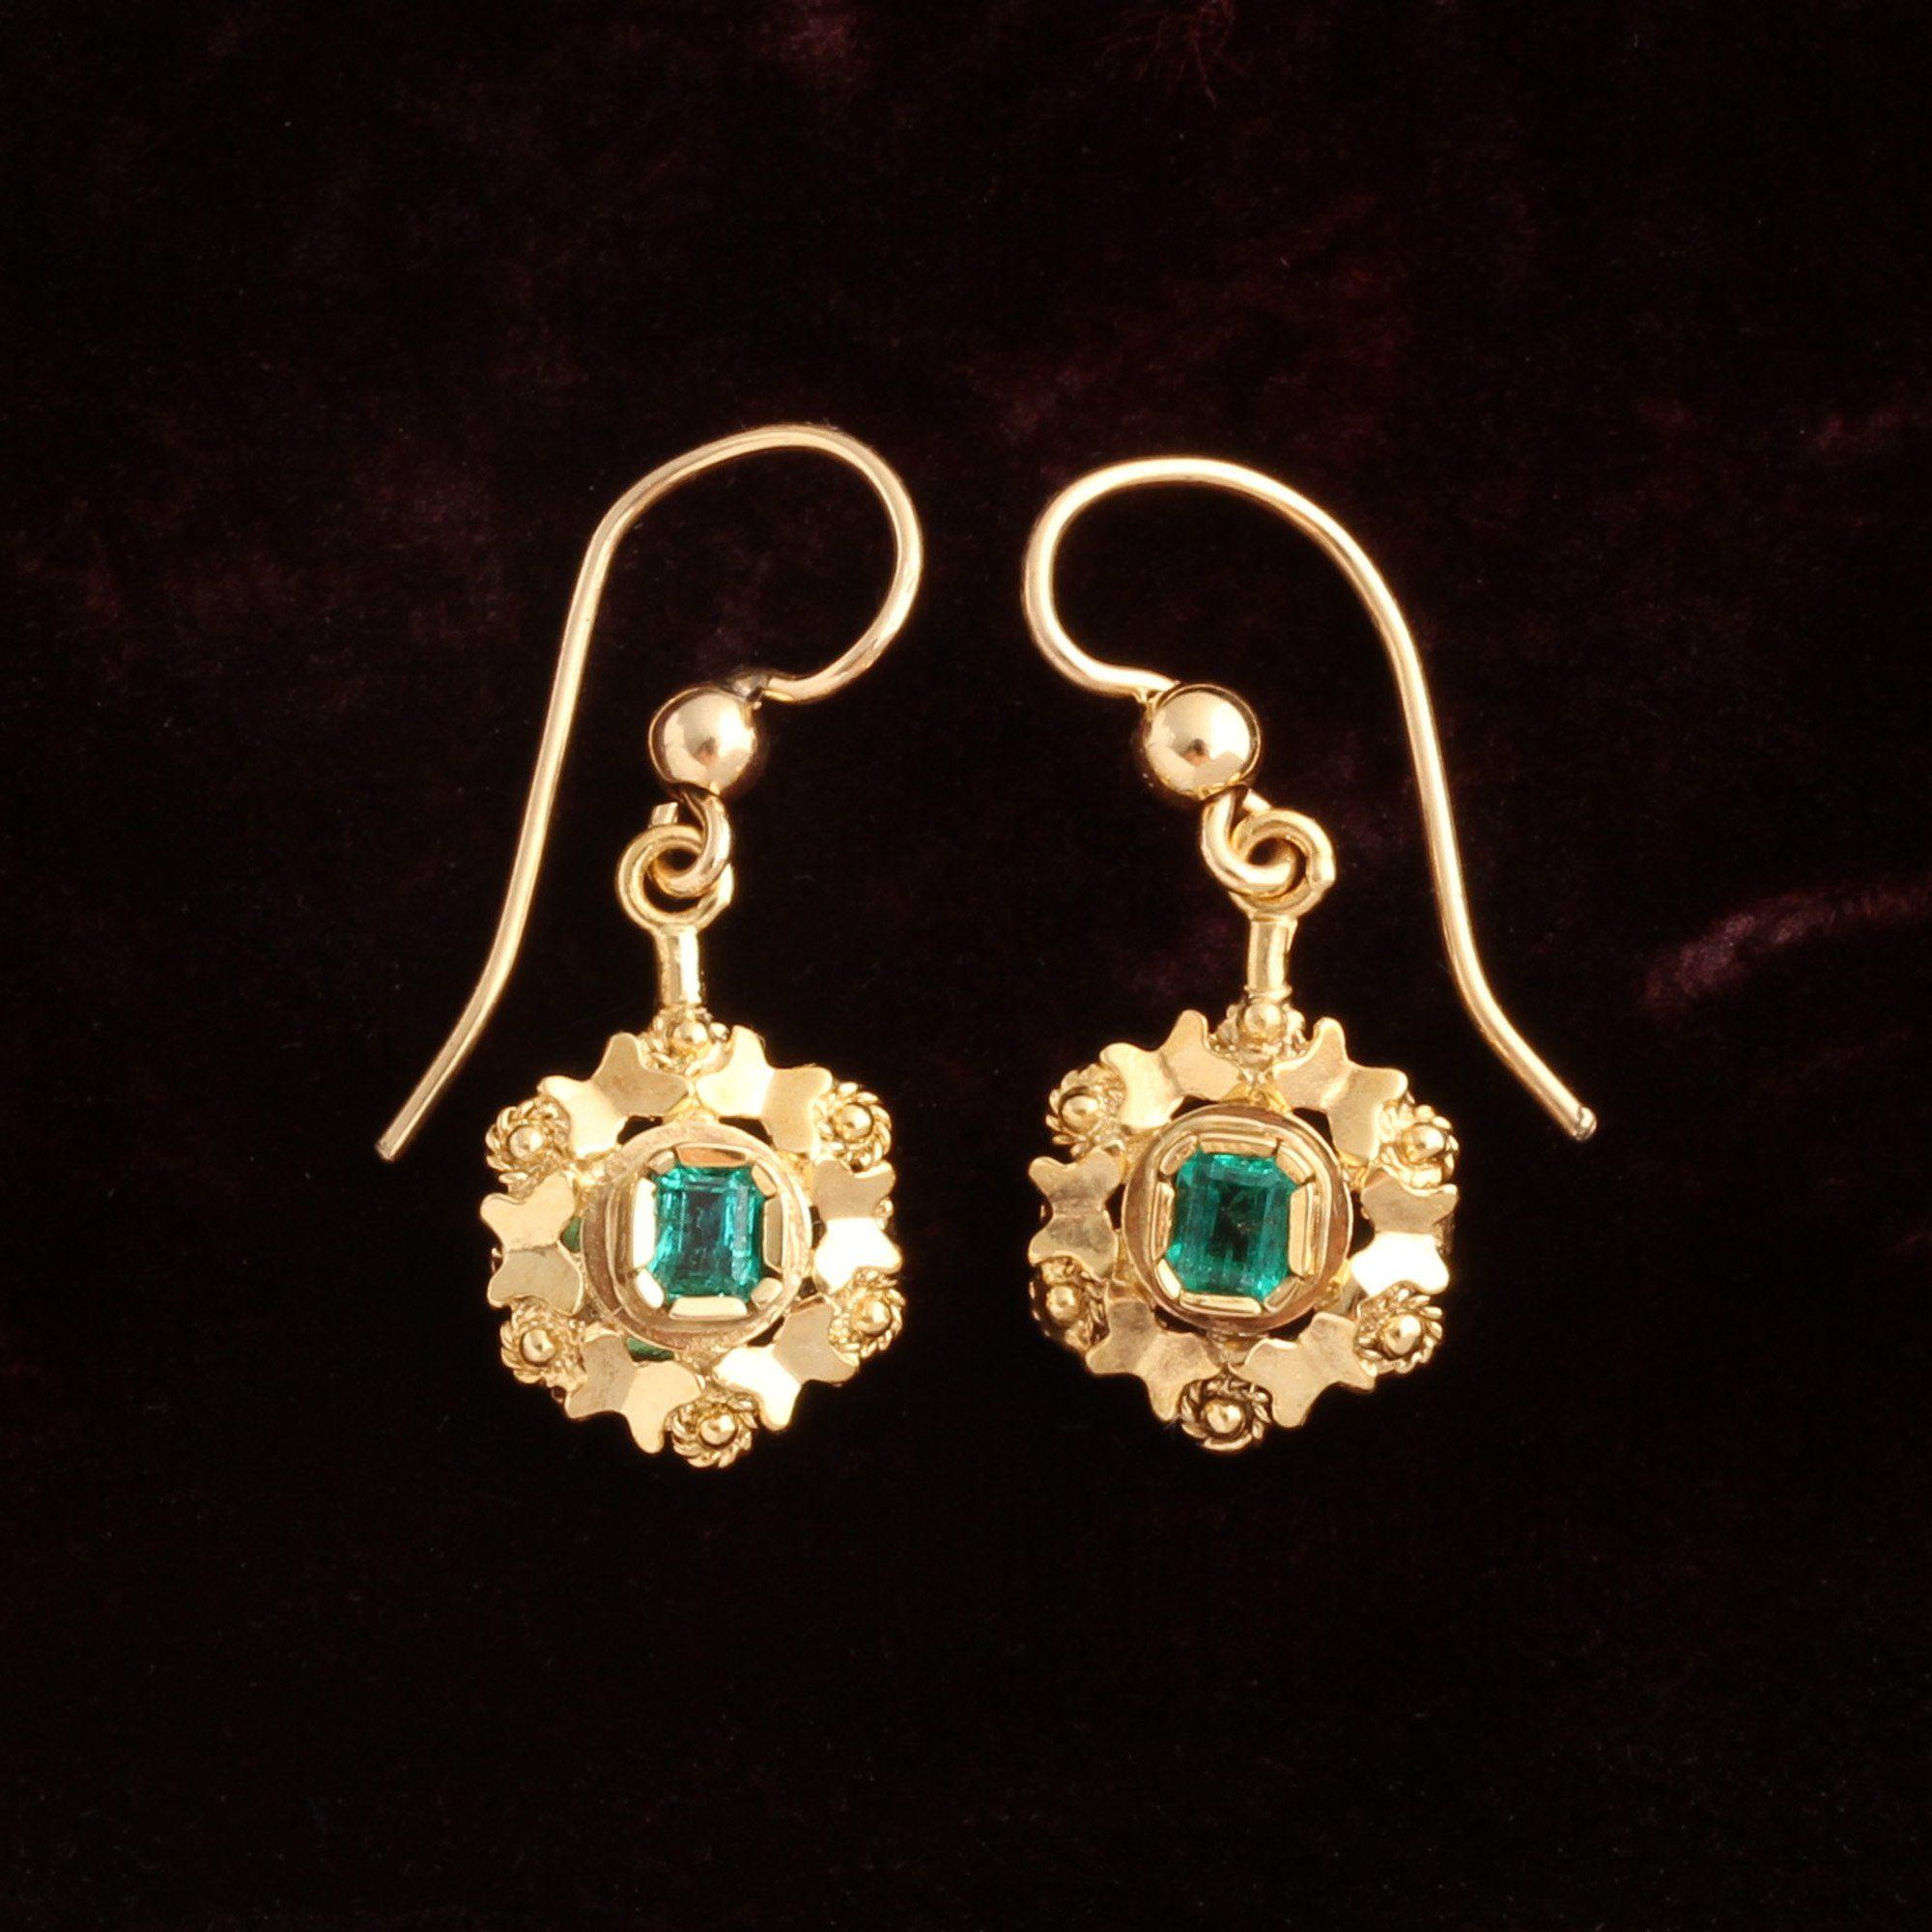 Victorian Emerald & Cannetille Earrings